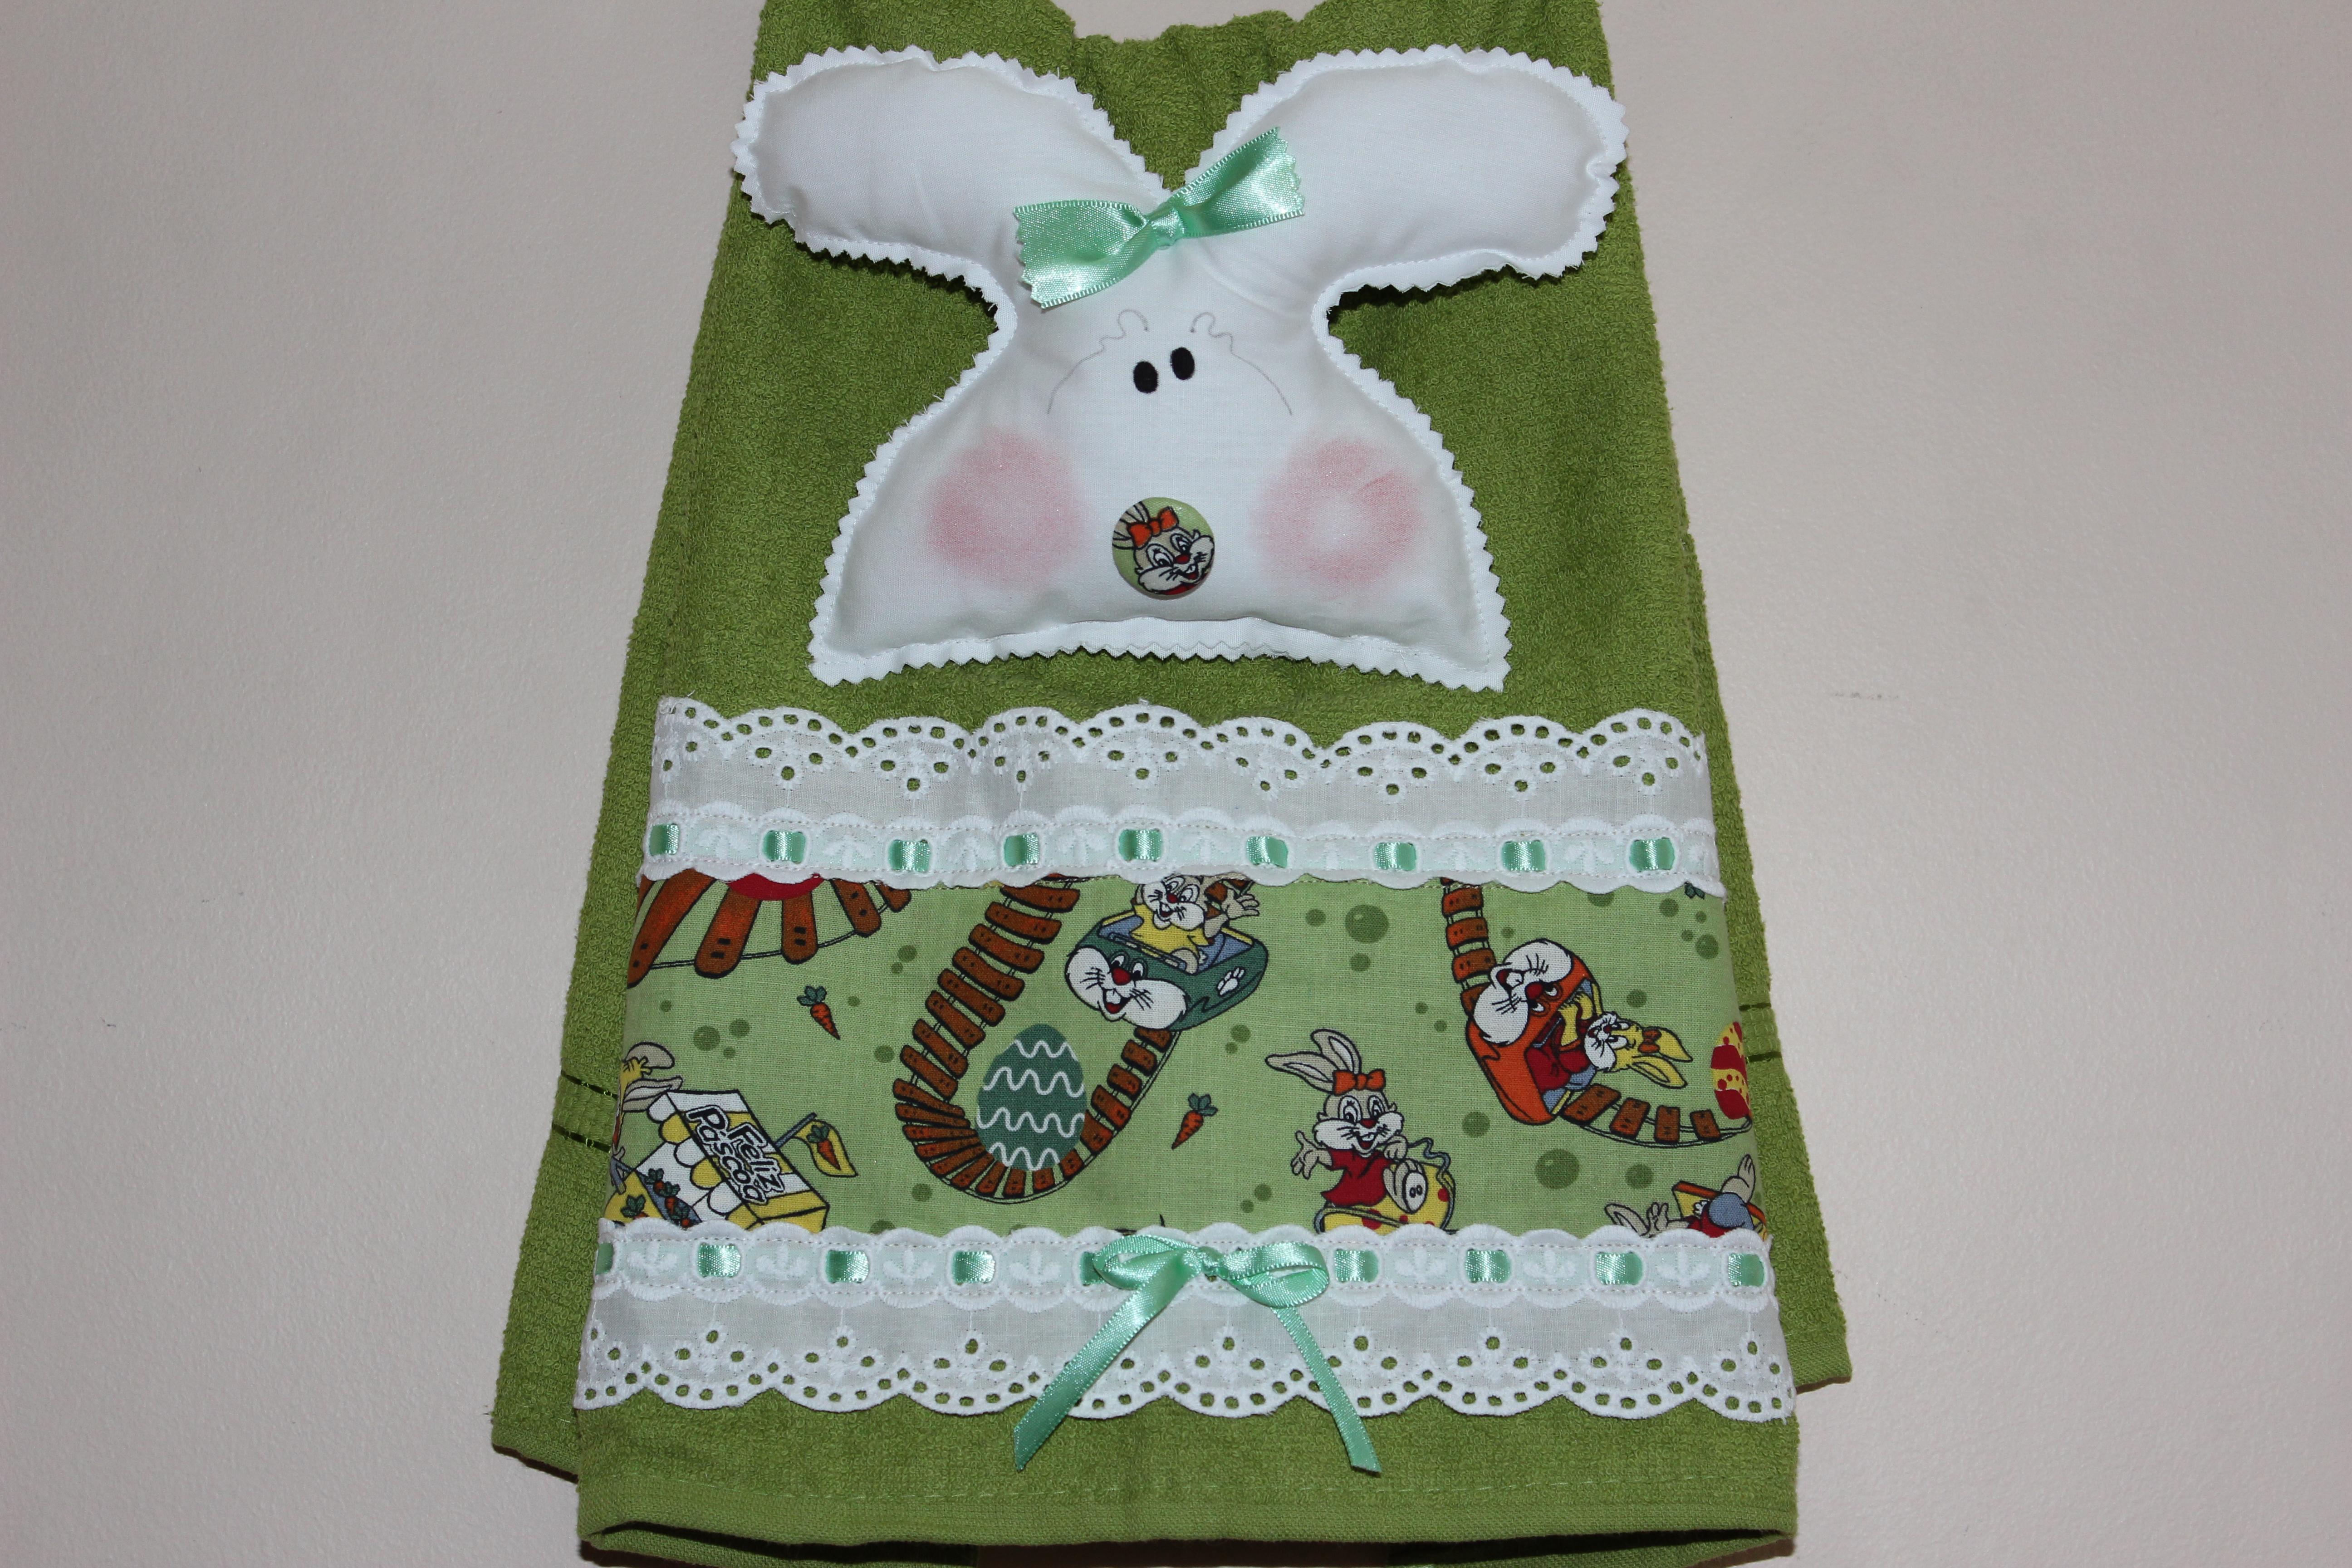 decoracao toalha lavabo:pascoa lavabo toalha para lavabo decoracao de pascoa coelhinho da